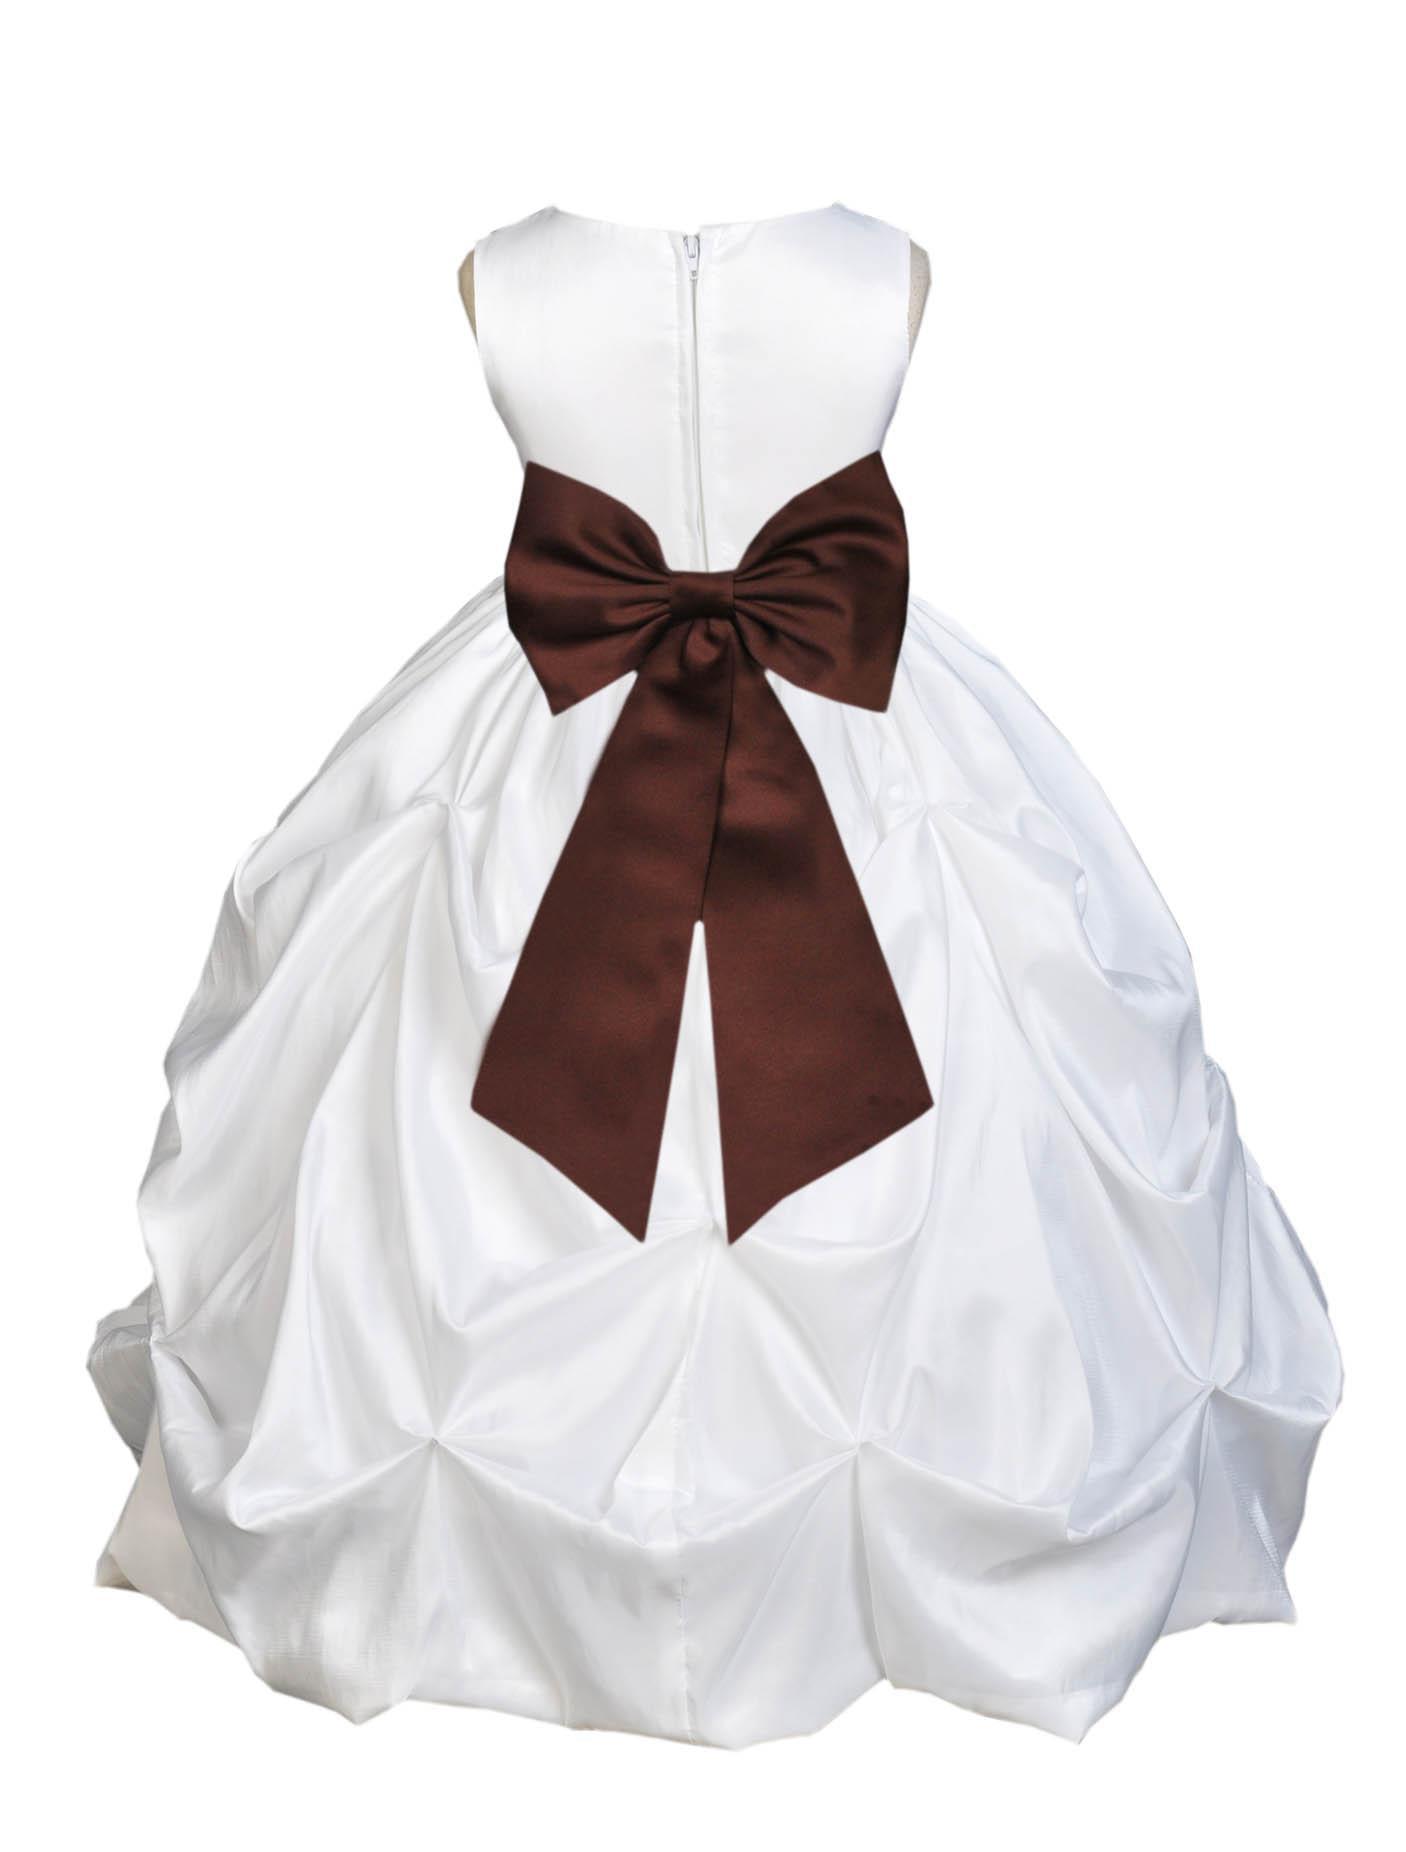 Ekidsbridal Formal Satin Taffeta White Flower Girl Dress Bridesmaid Wedding Pageant Toddler Recital Holiday Communion Birthday Baptism Occasions 301T